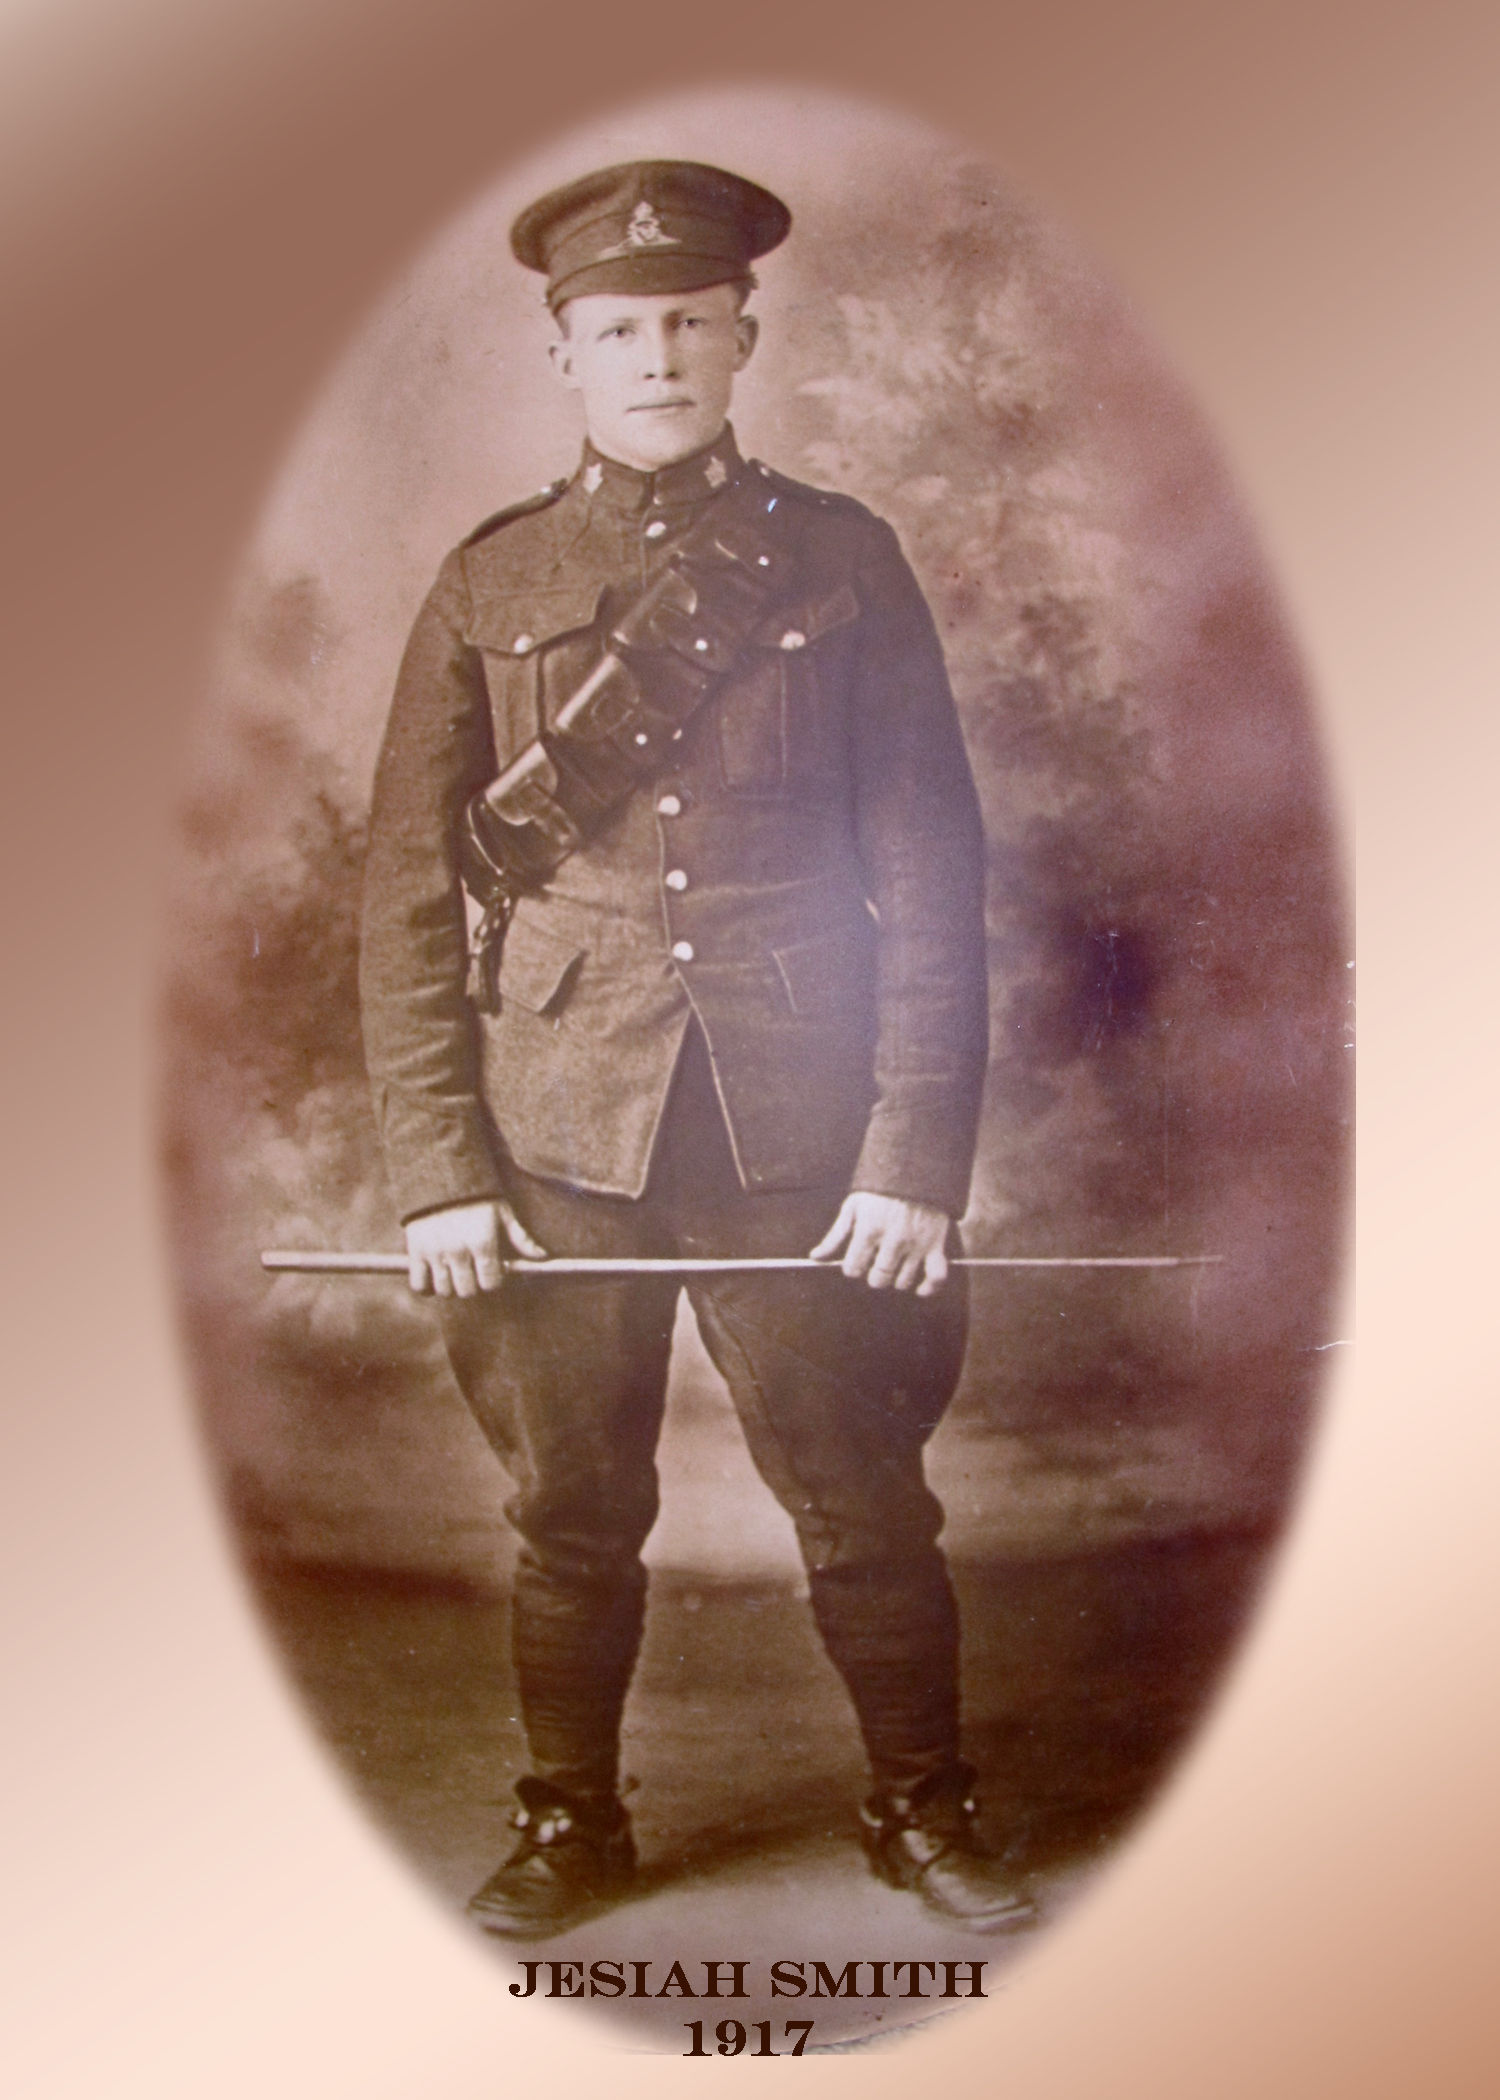 1917-12-08 JESIAH SMITH, C.E.F copy